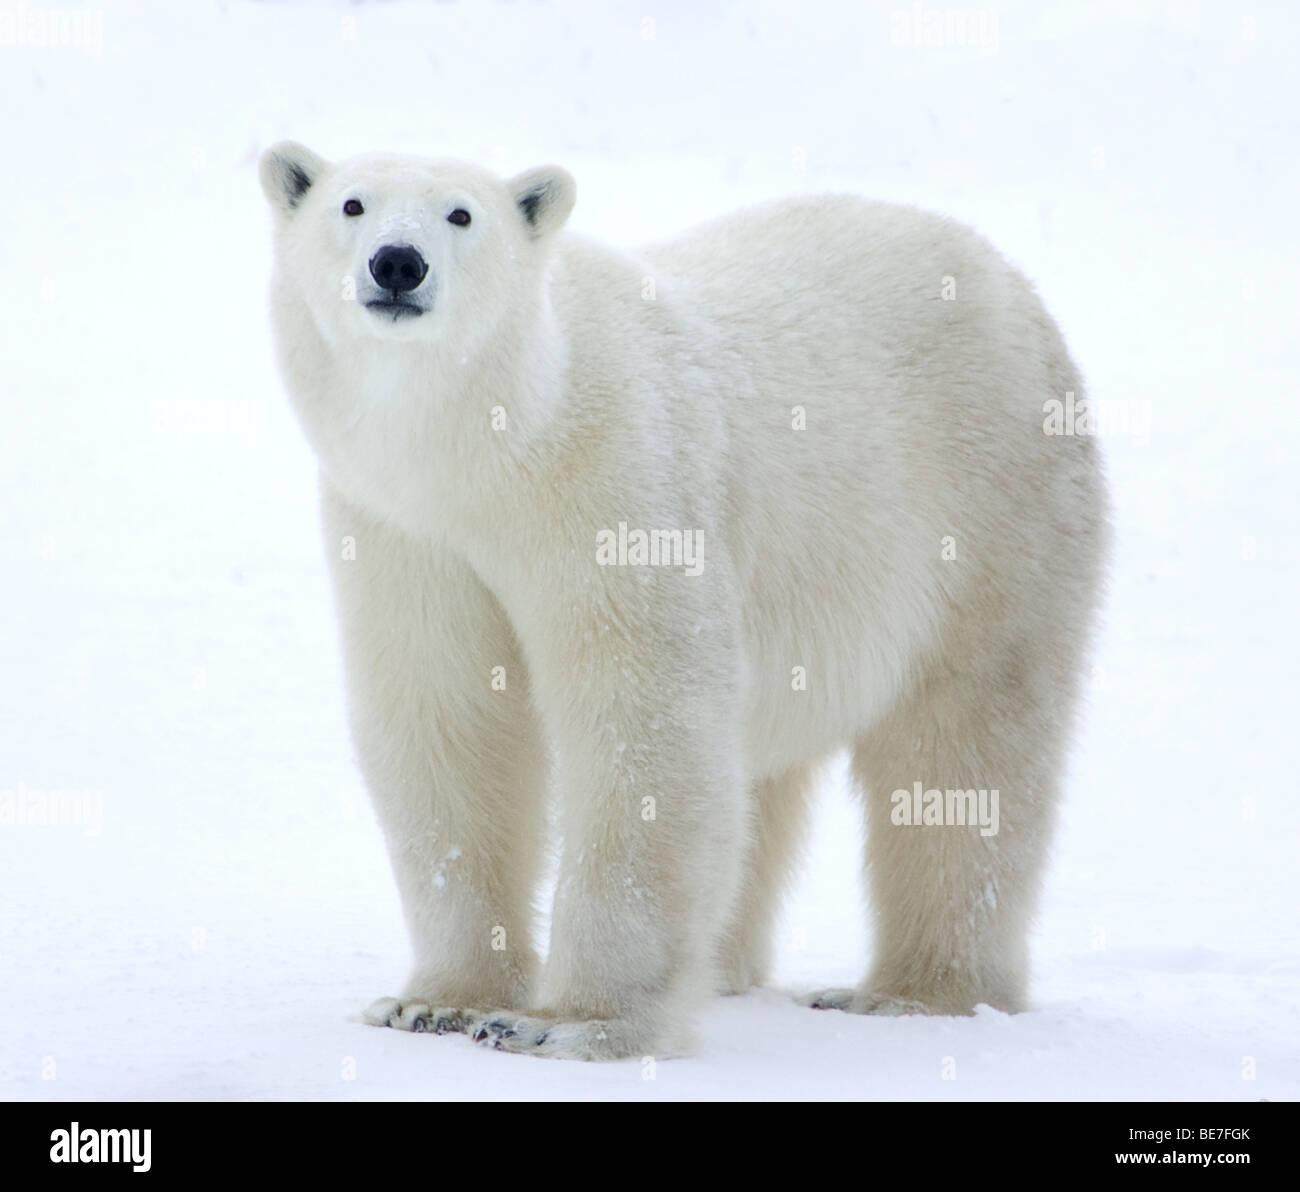 Polar bear standing in field Photo Stock